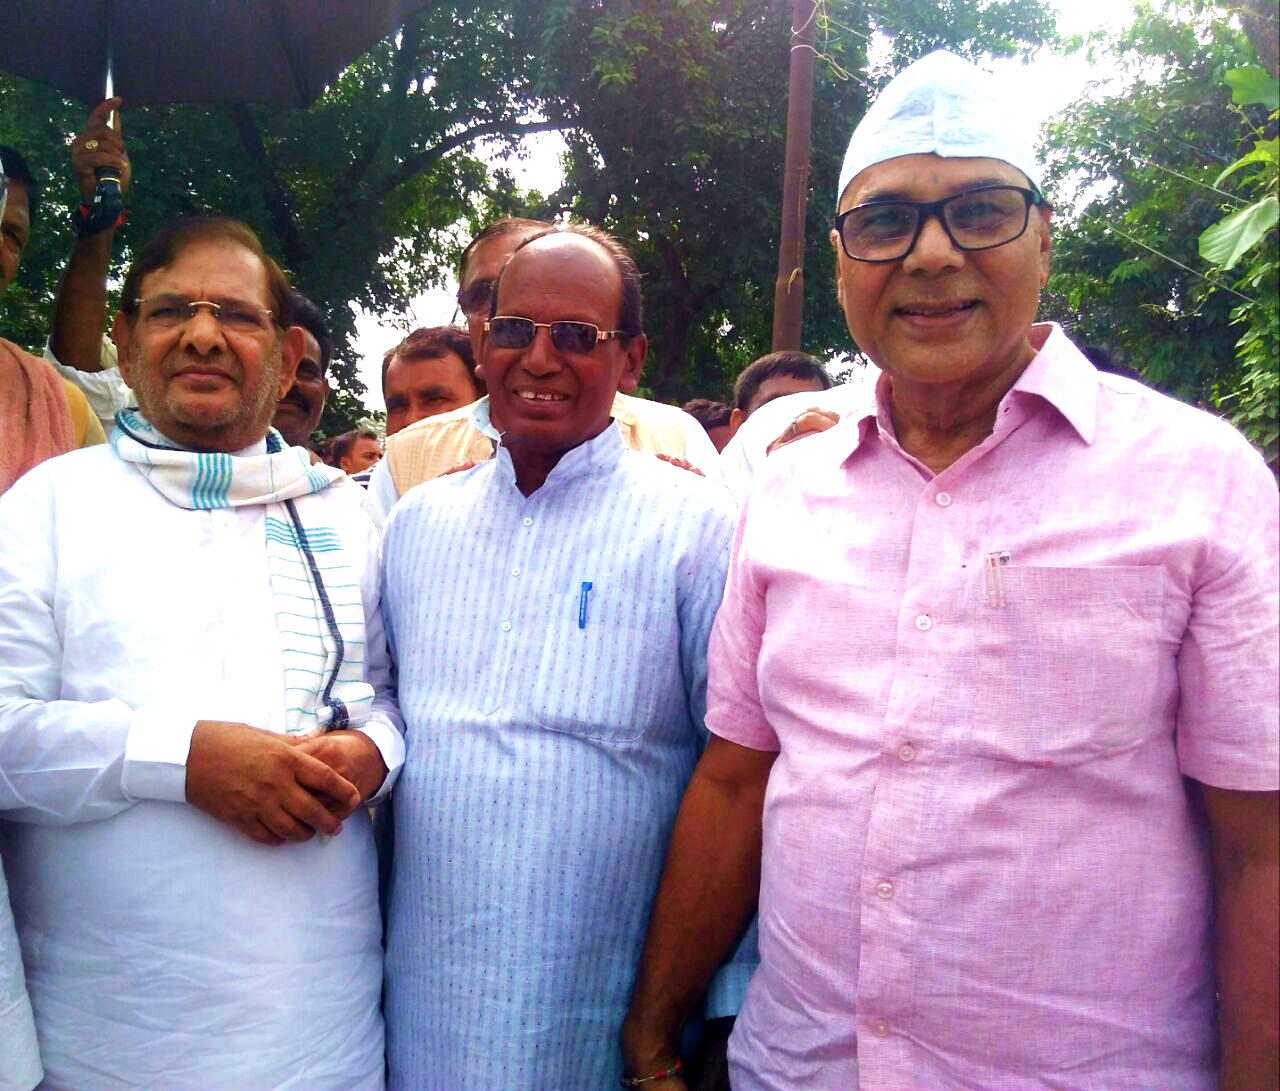 Veteran National Leader of Social Justice Shri Sharad Yadav with Dr.BN Madhepuri , Shri Kamal Das , Shri Vijay Kumar Verma & others just to greet Eid Namazees at Madhepura.